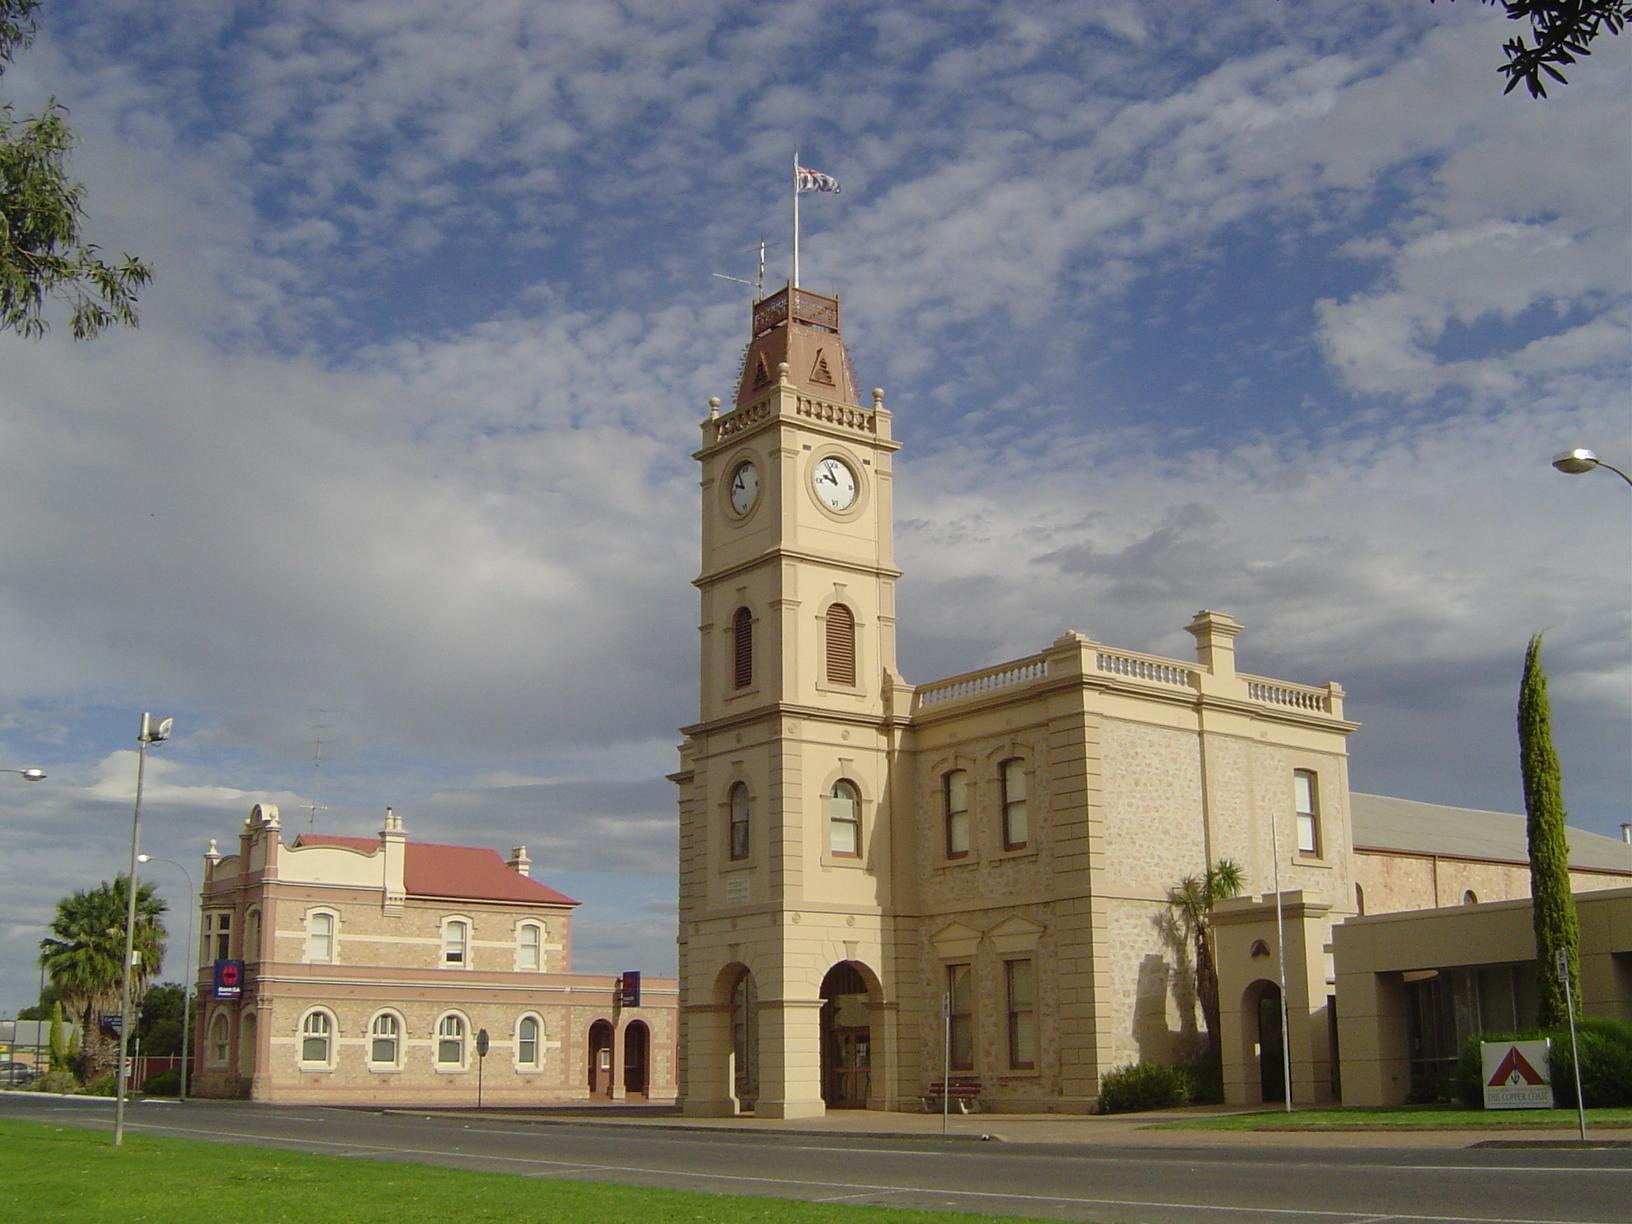 Kadina Australia  city pictures gallery : Town Hall, Kadina, Copper Triangle, South Australia